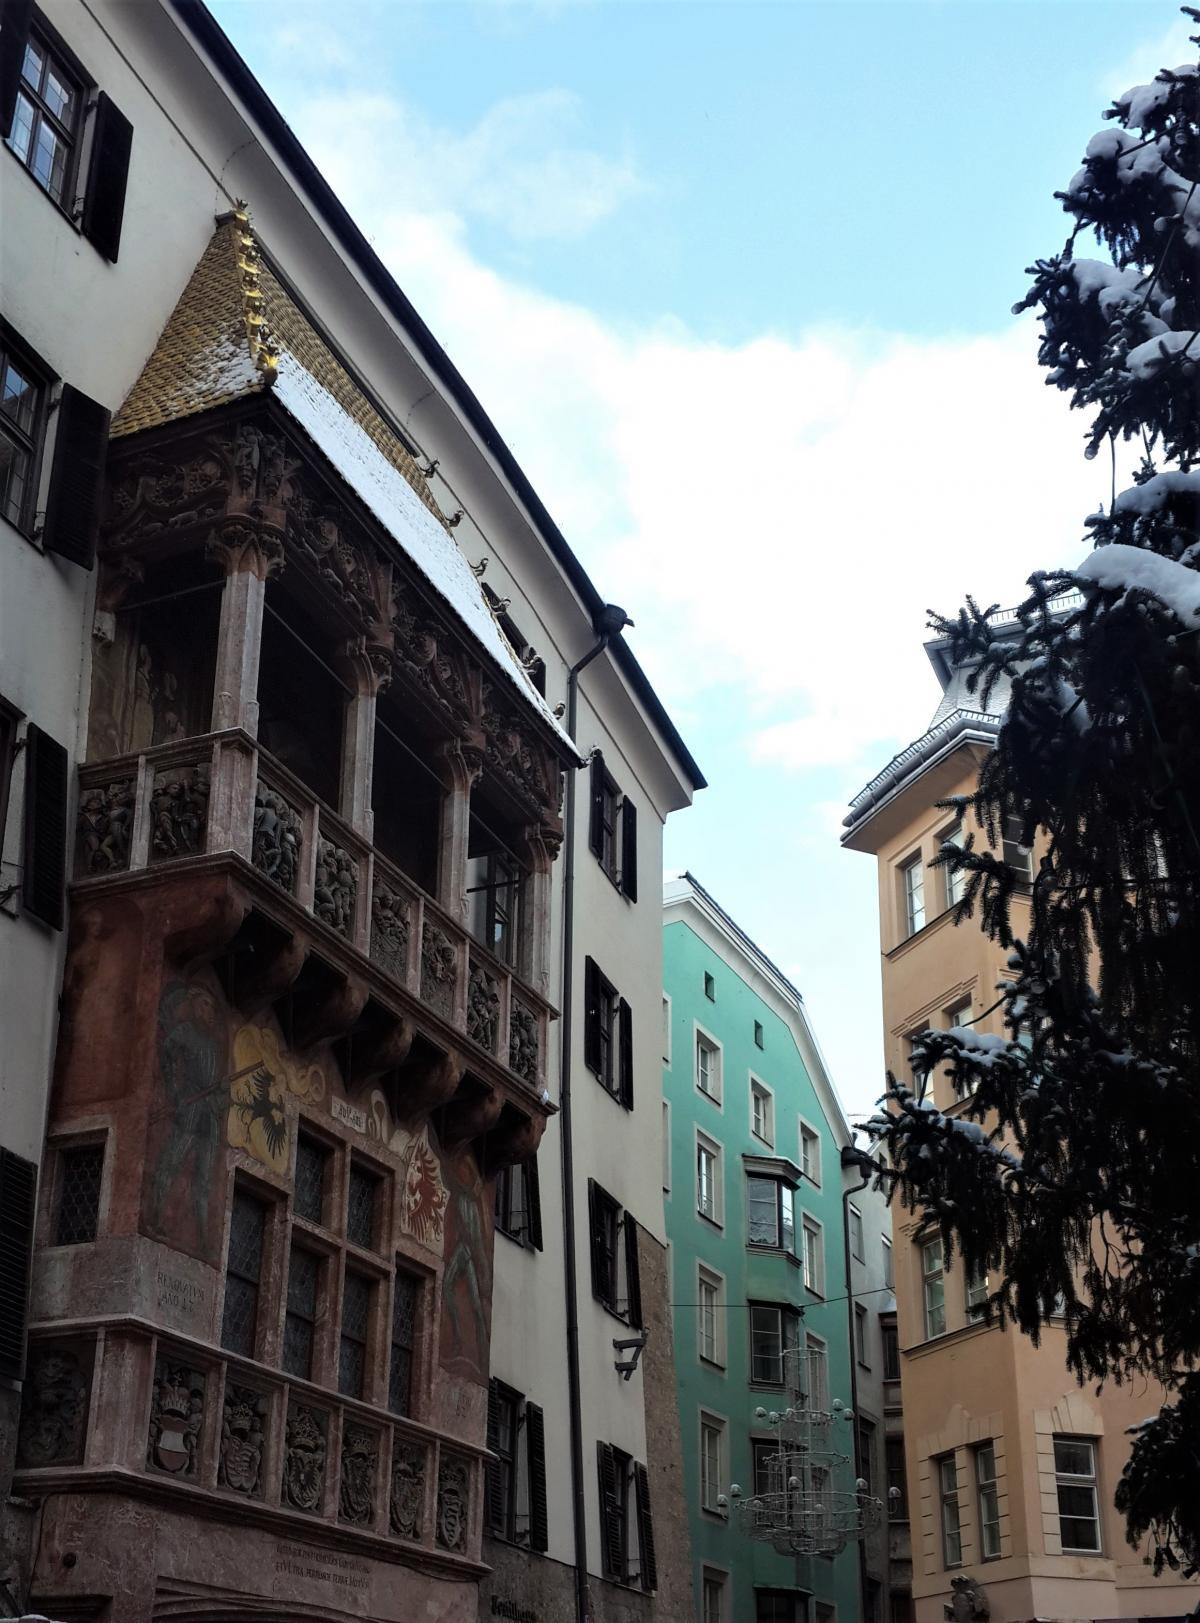 Балкон з золотим дахом в Інсбруку / Фото Марина Григоренко